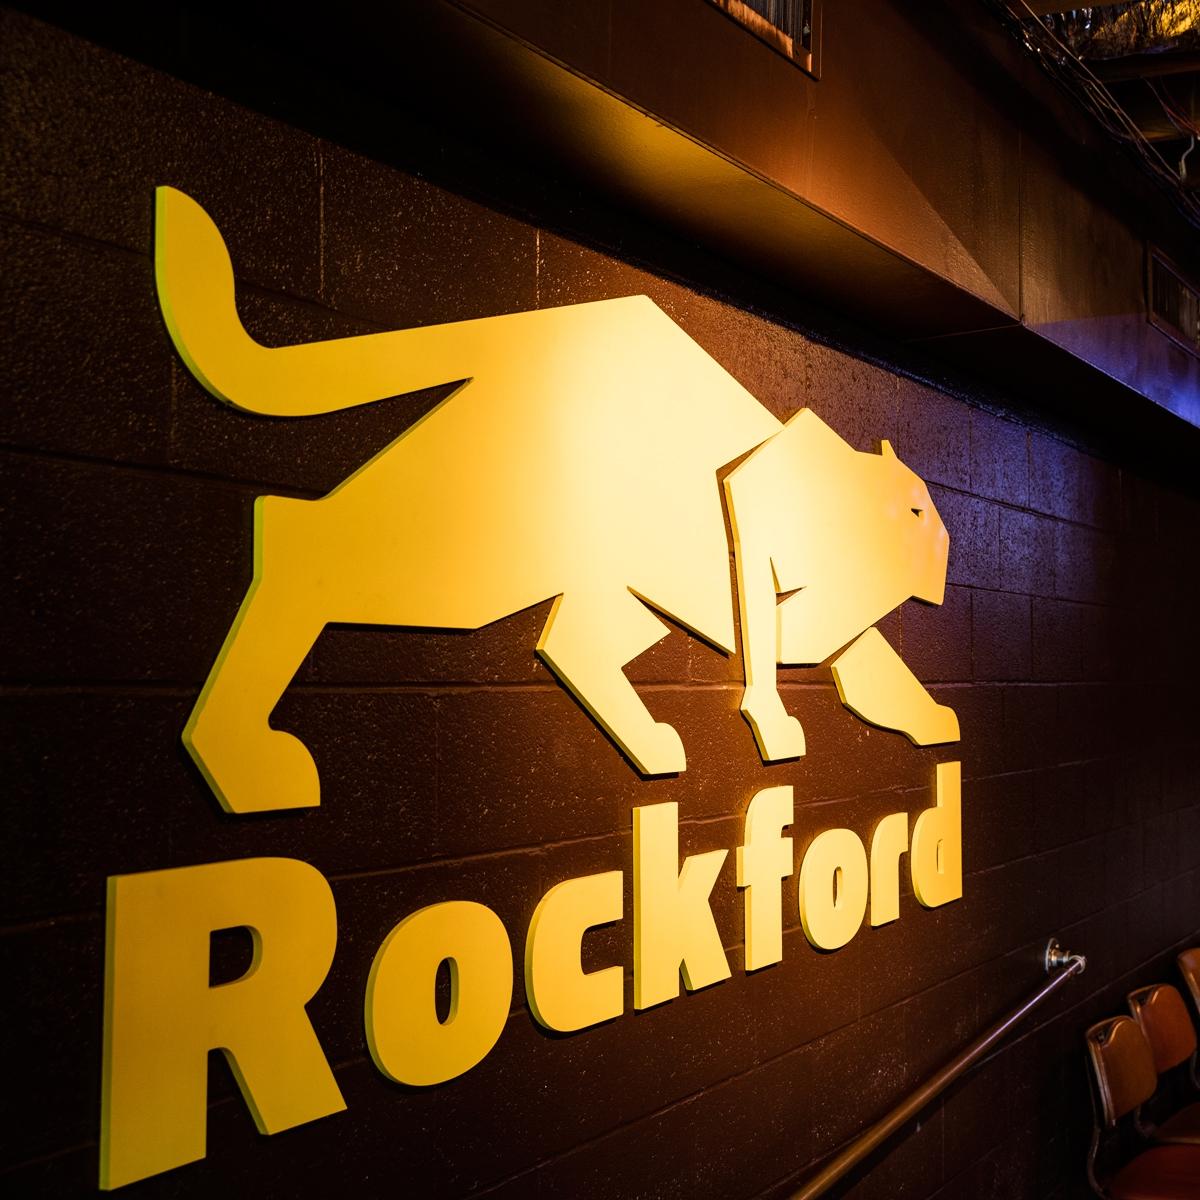 RockfordInteriorSignage.jpg